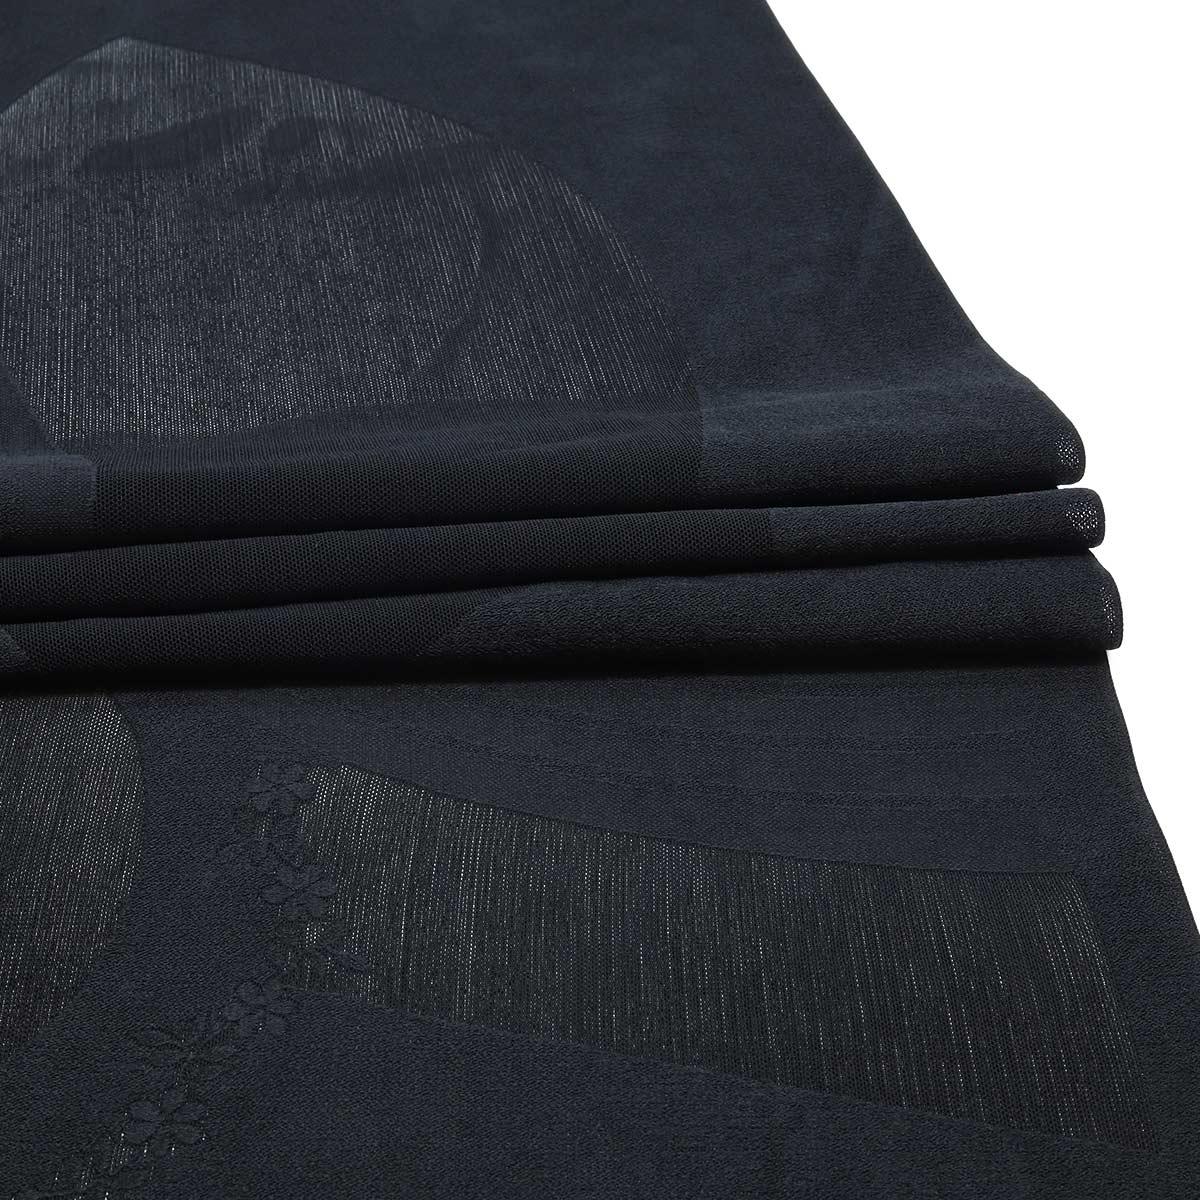 SU 115 Ткань эластичная бельевая 44 см*10